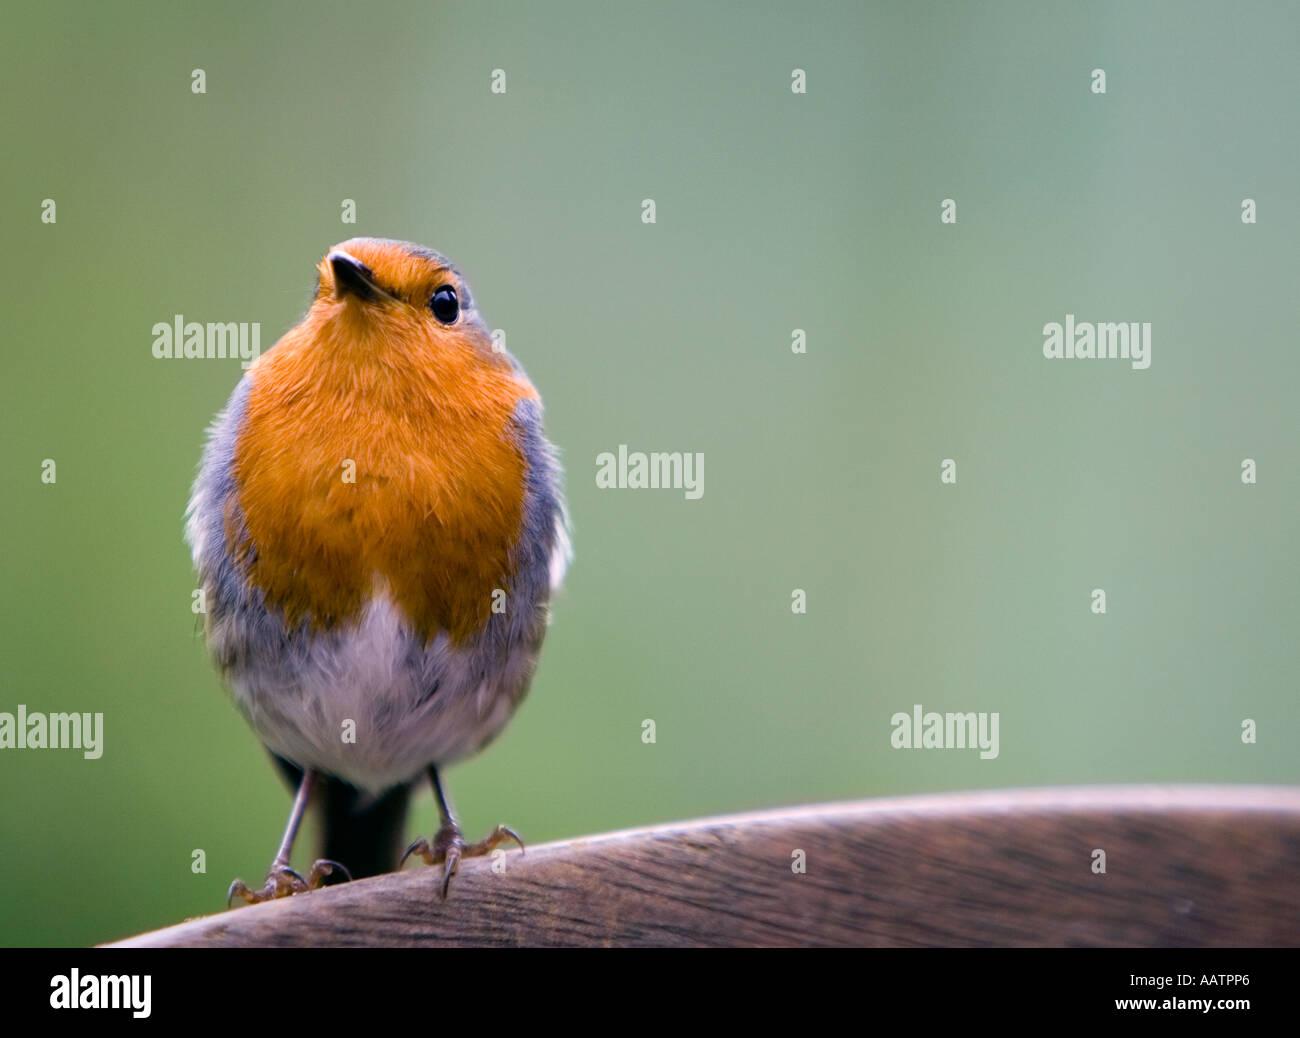 Erithacus rubecula. Robin standing on garden bench - Stock Image